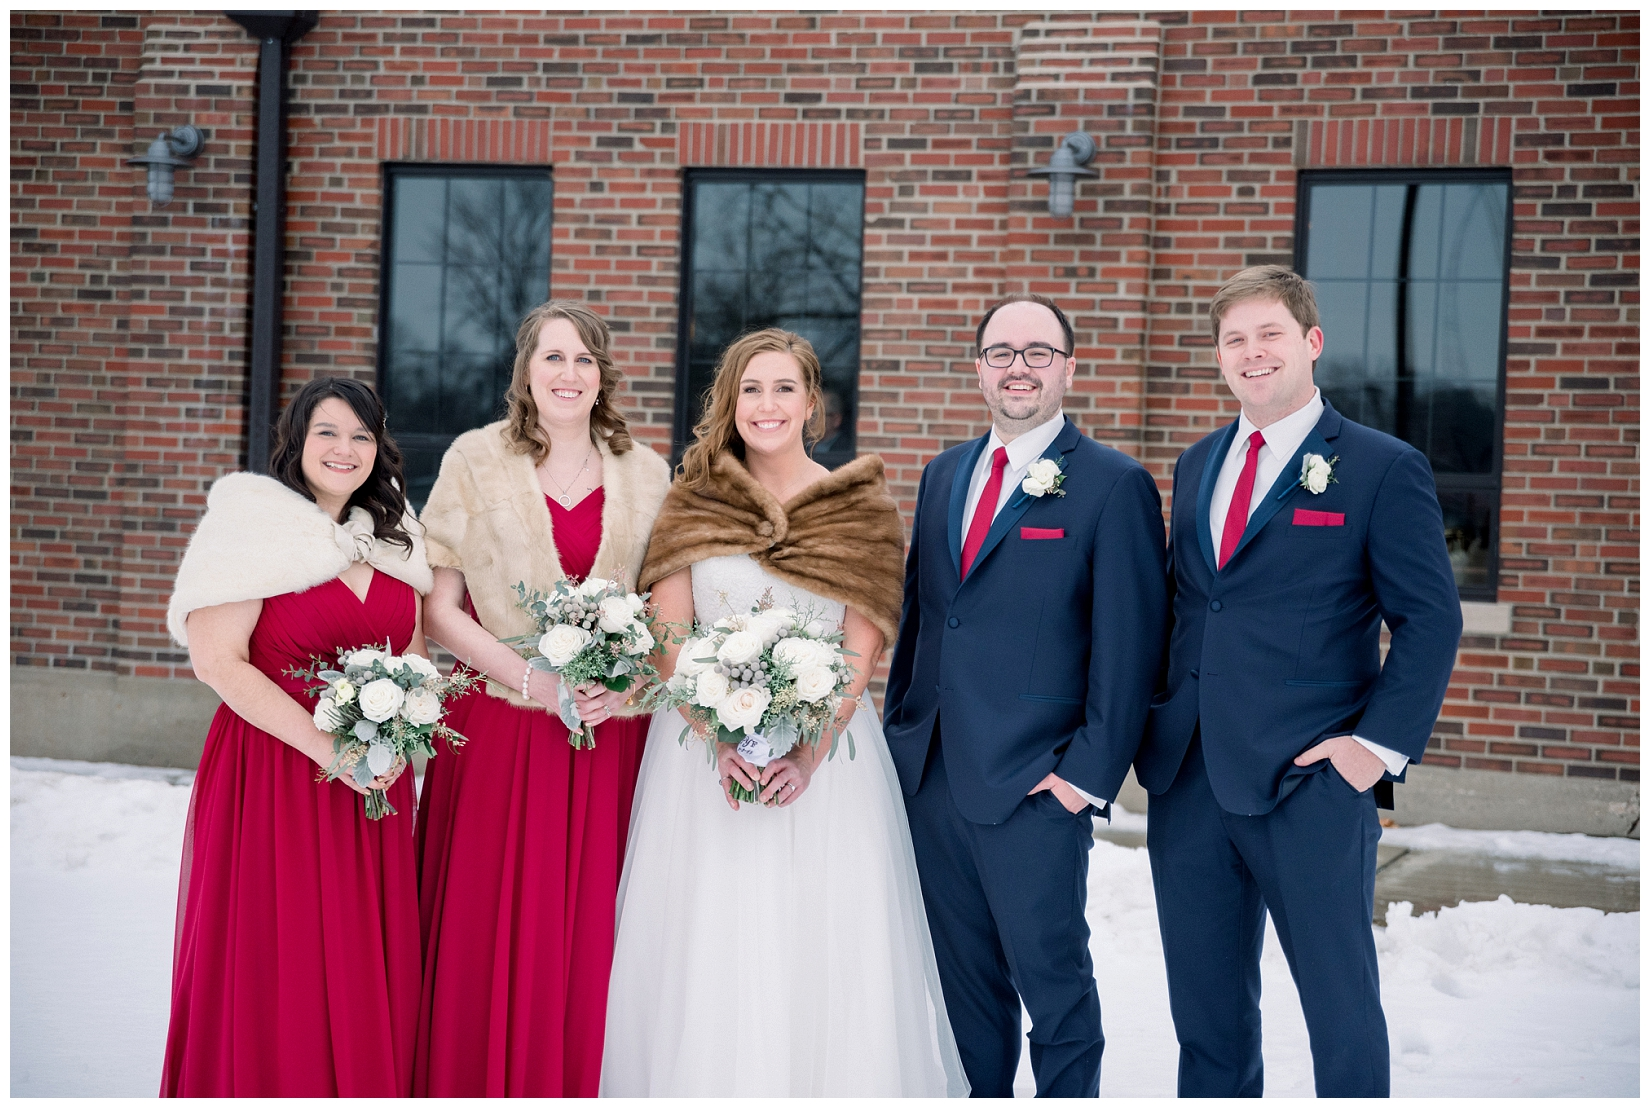 cat-alkire-wedding-photographer-indiana-chicago-indianapolis-fort-wayne_0954.jpg